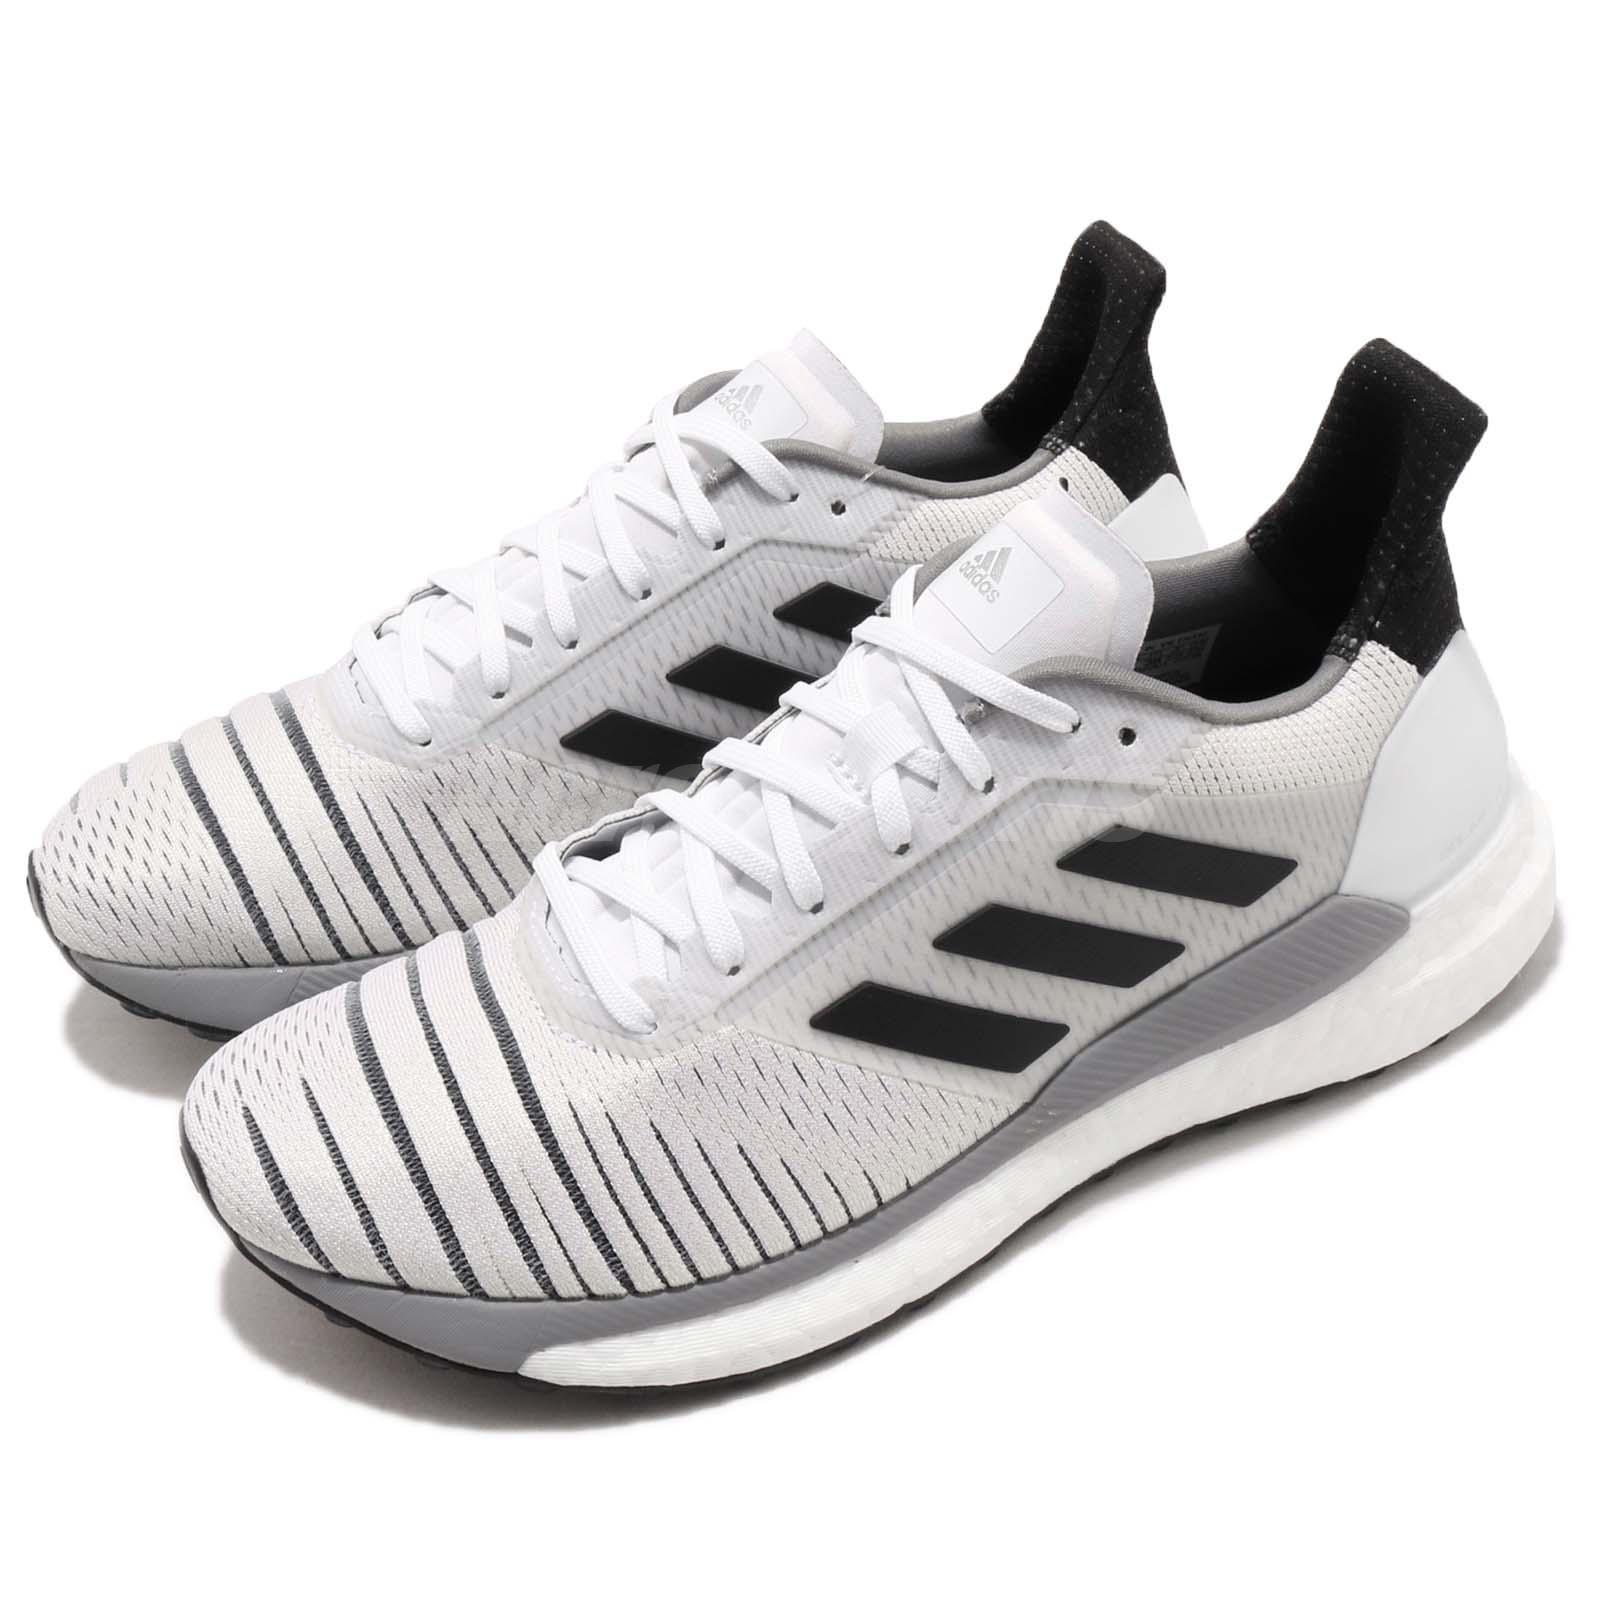 adidas Solar Glide W Boost White Black